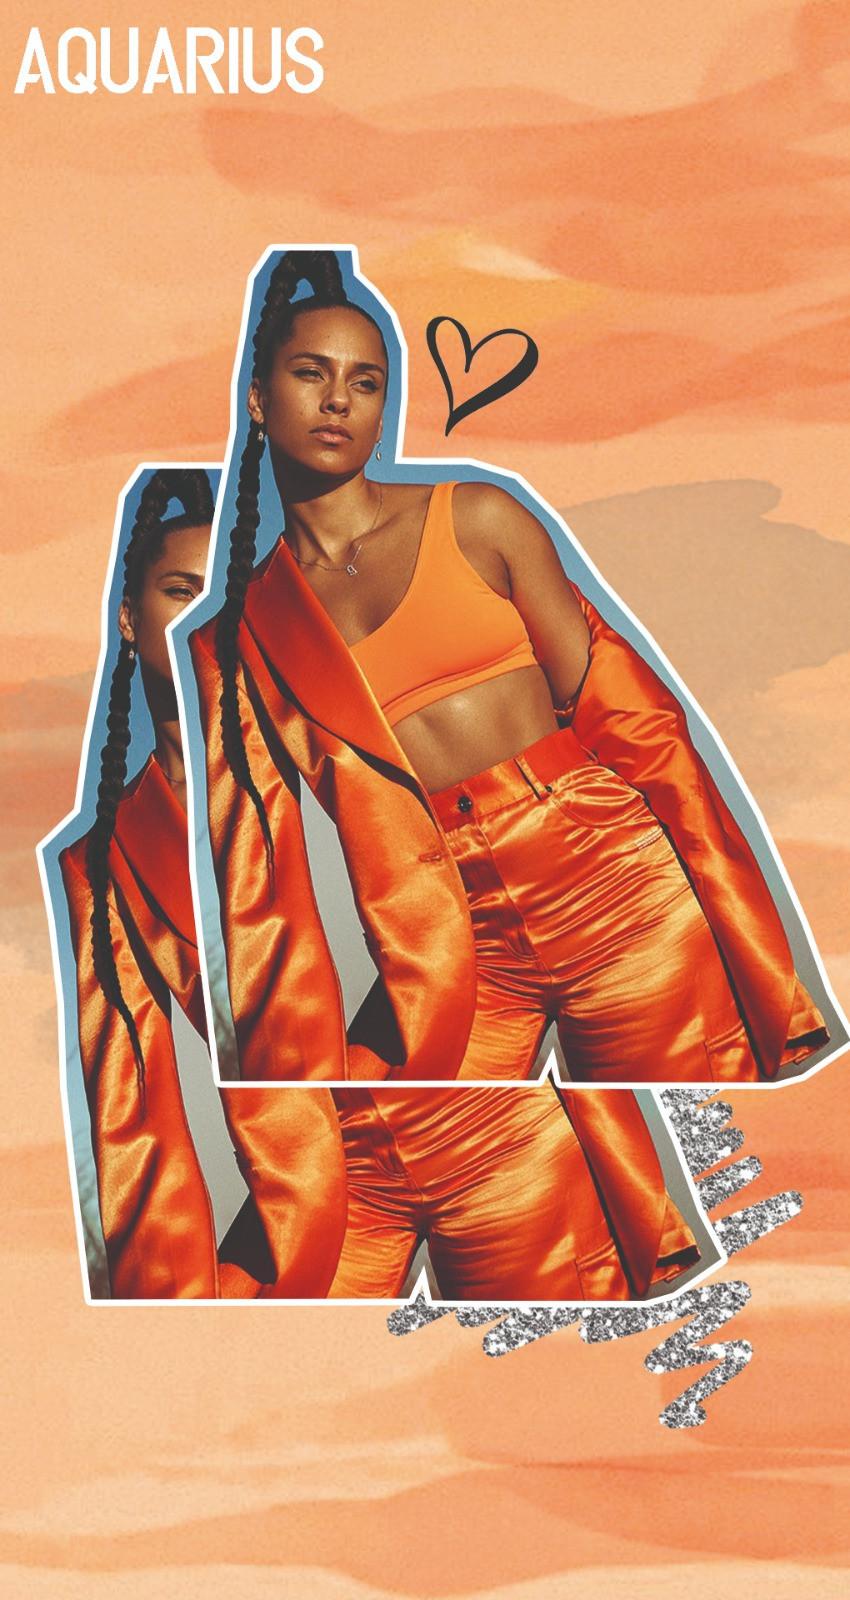 Alicia Keys image via Billboard